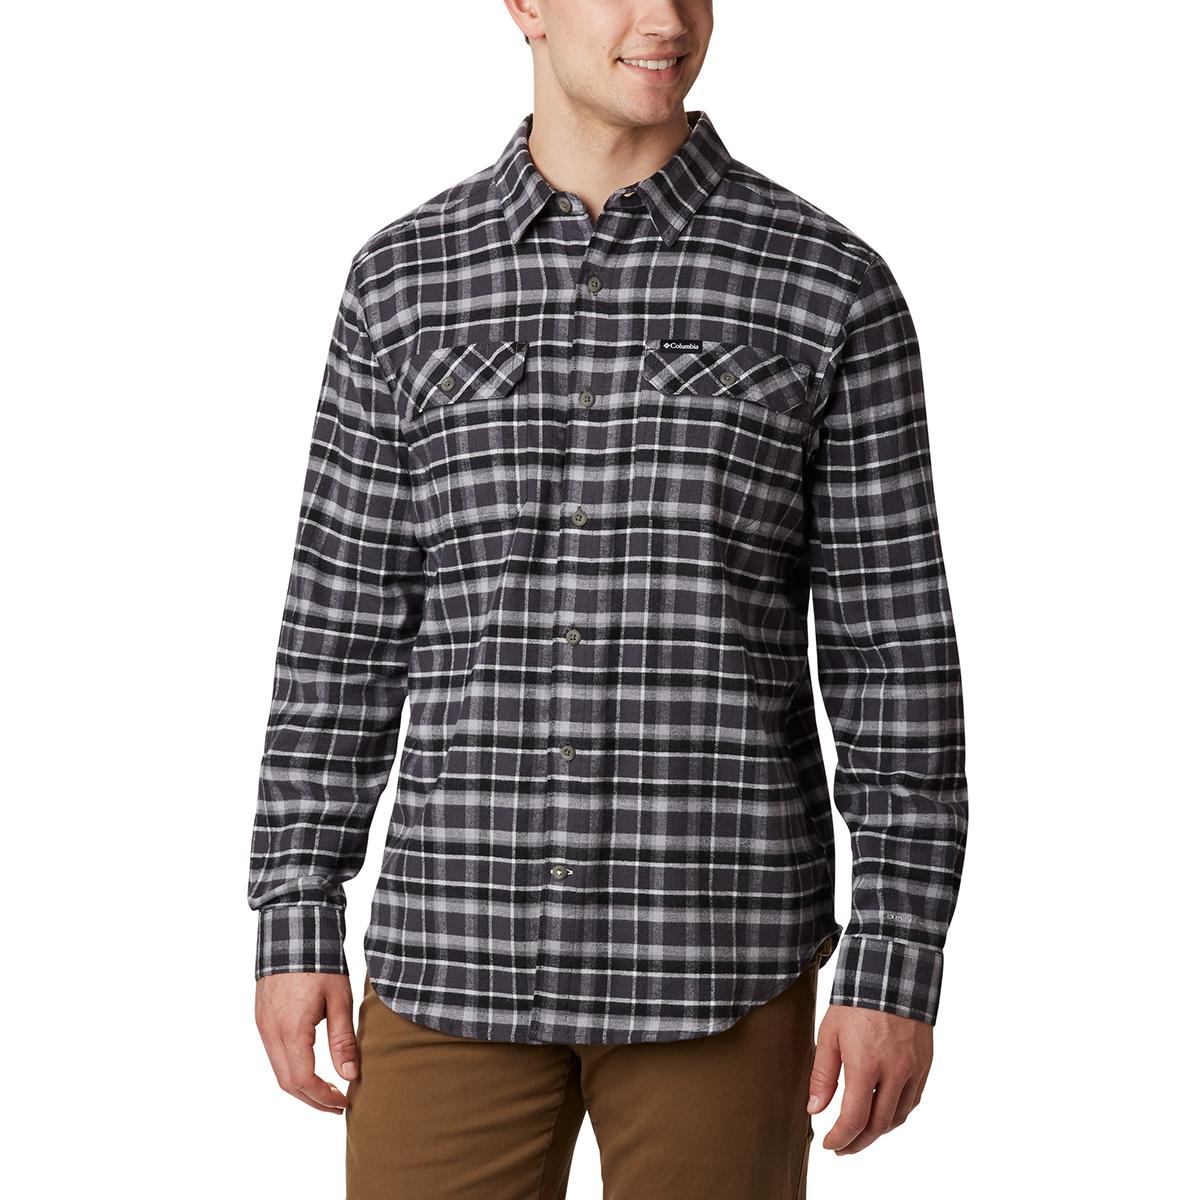 Columbia Men's Flare Gun Stretch Flannel Shirt - Black, L